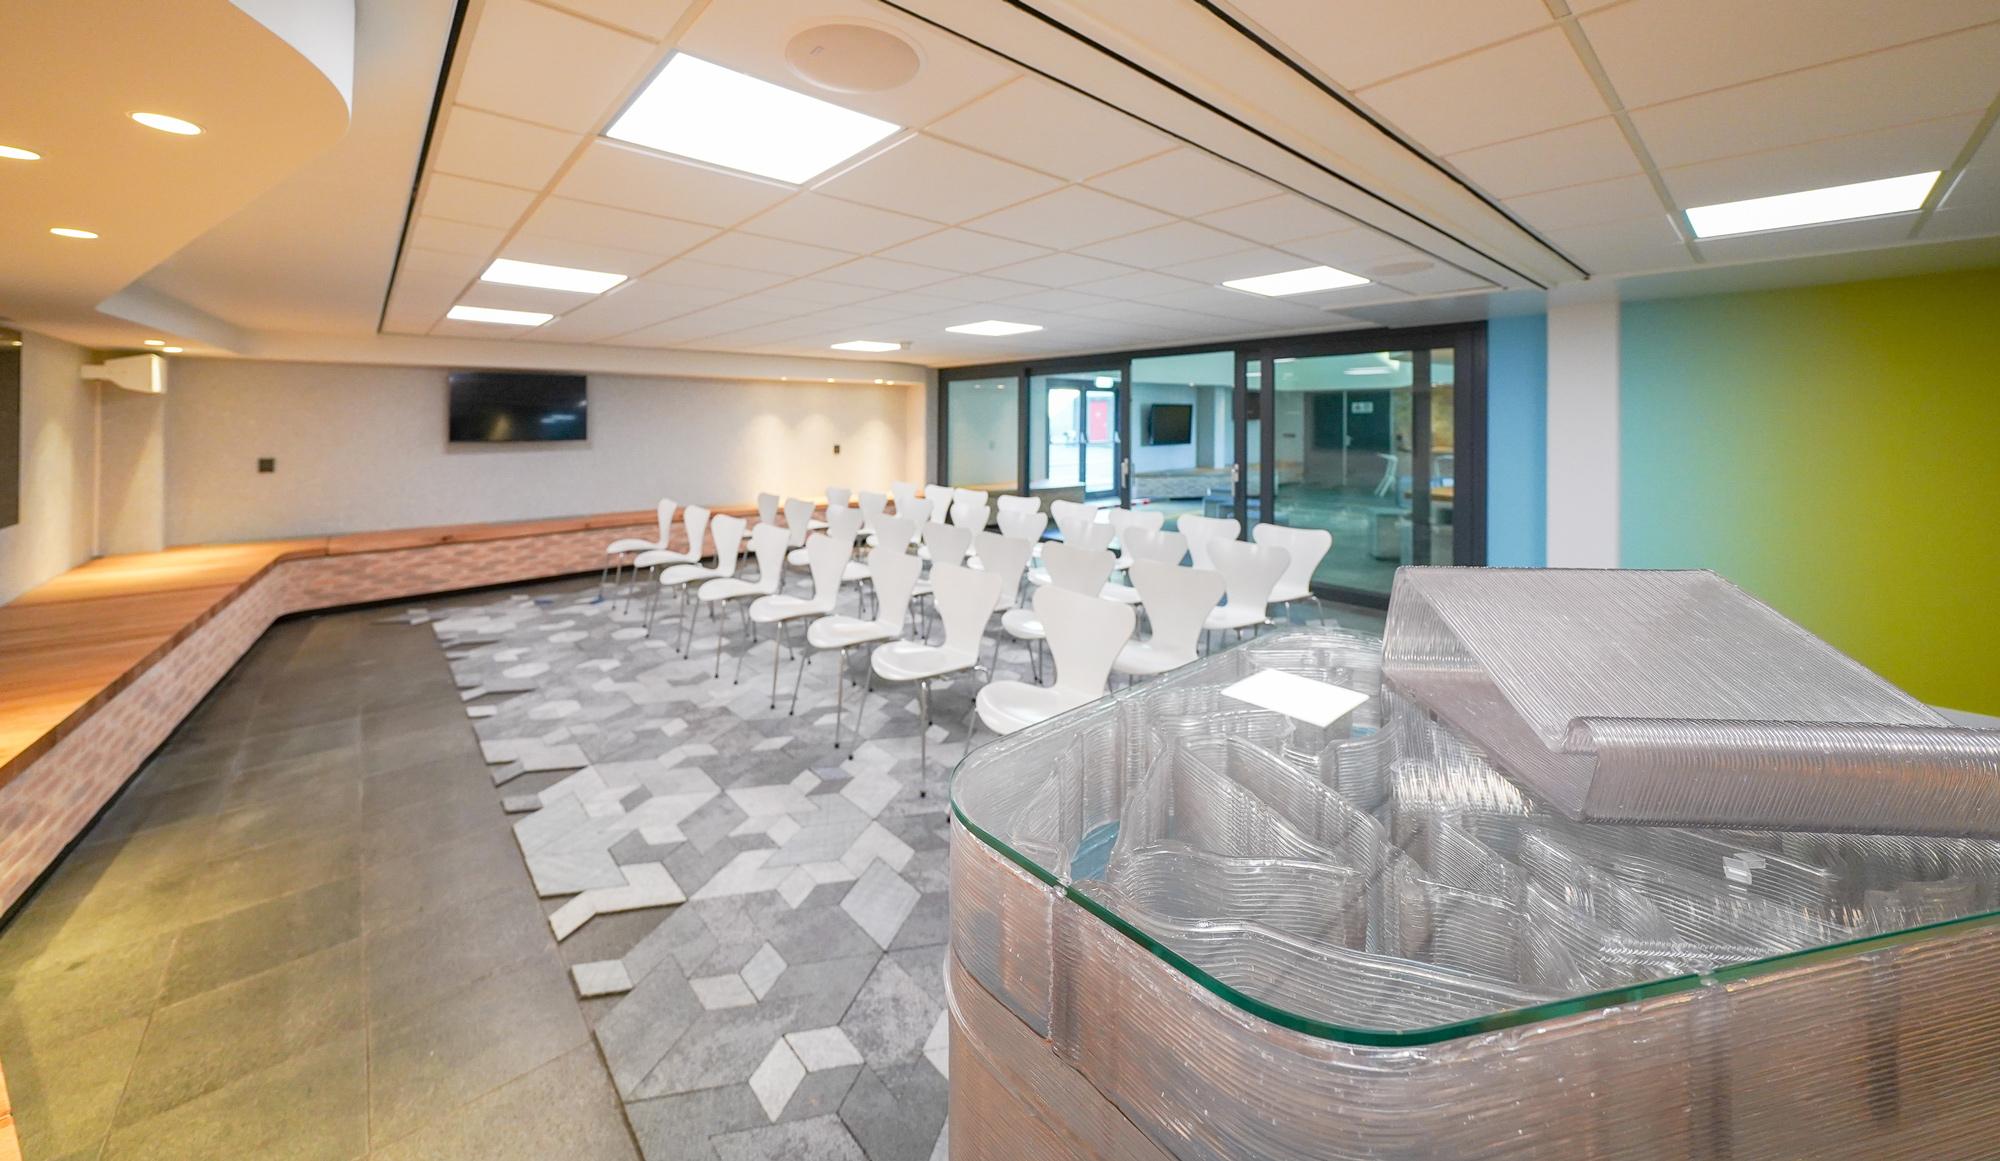 presentatie_zaal_auditorium_recycle_tapijt_architect